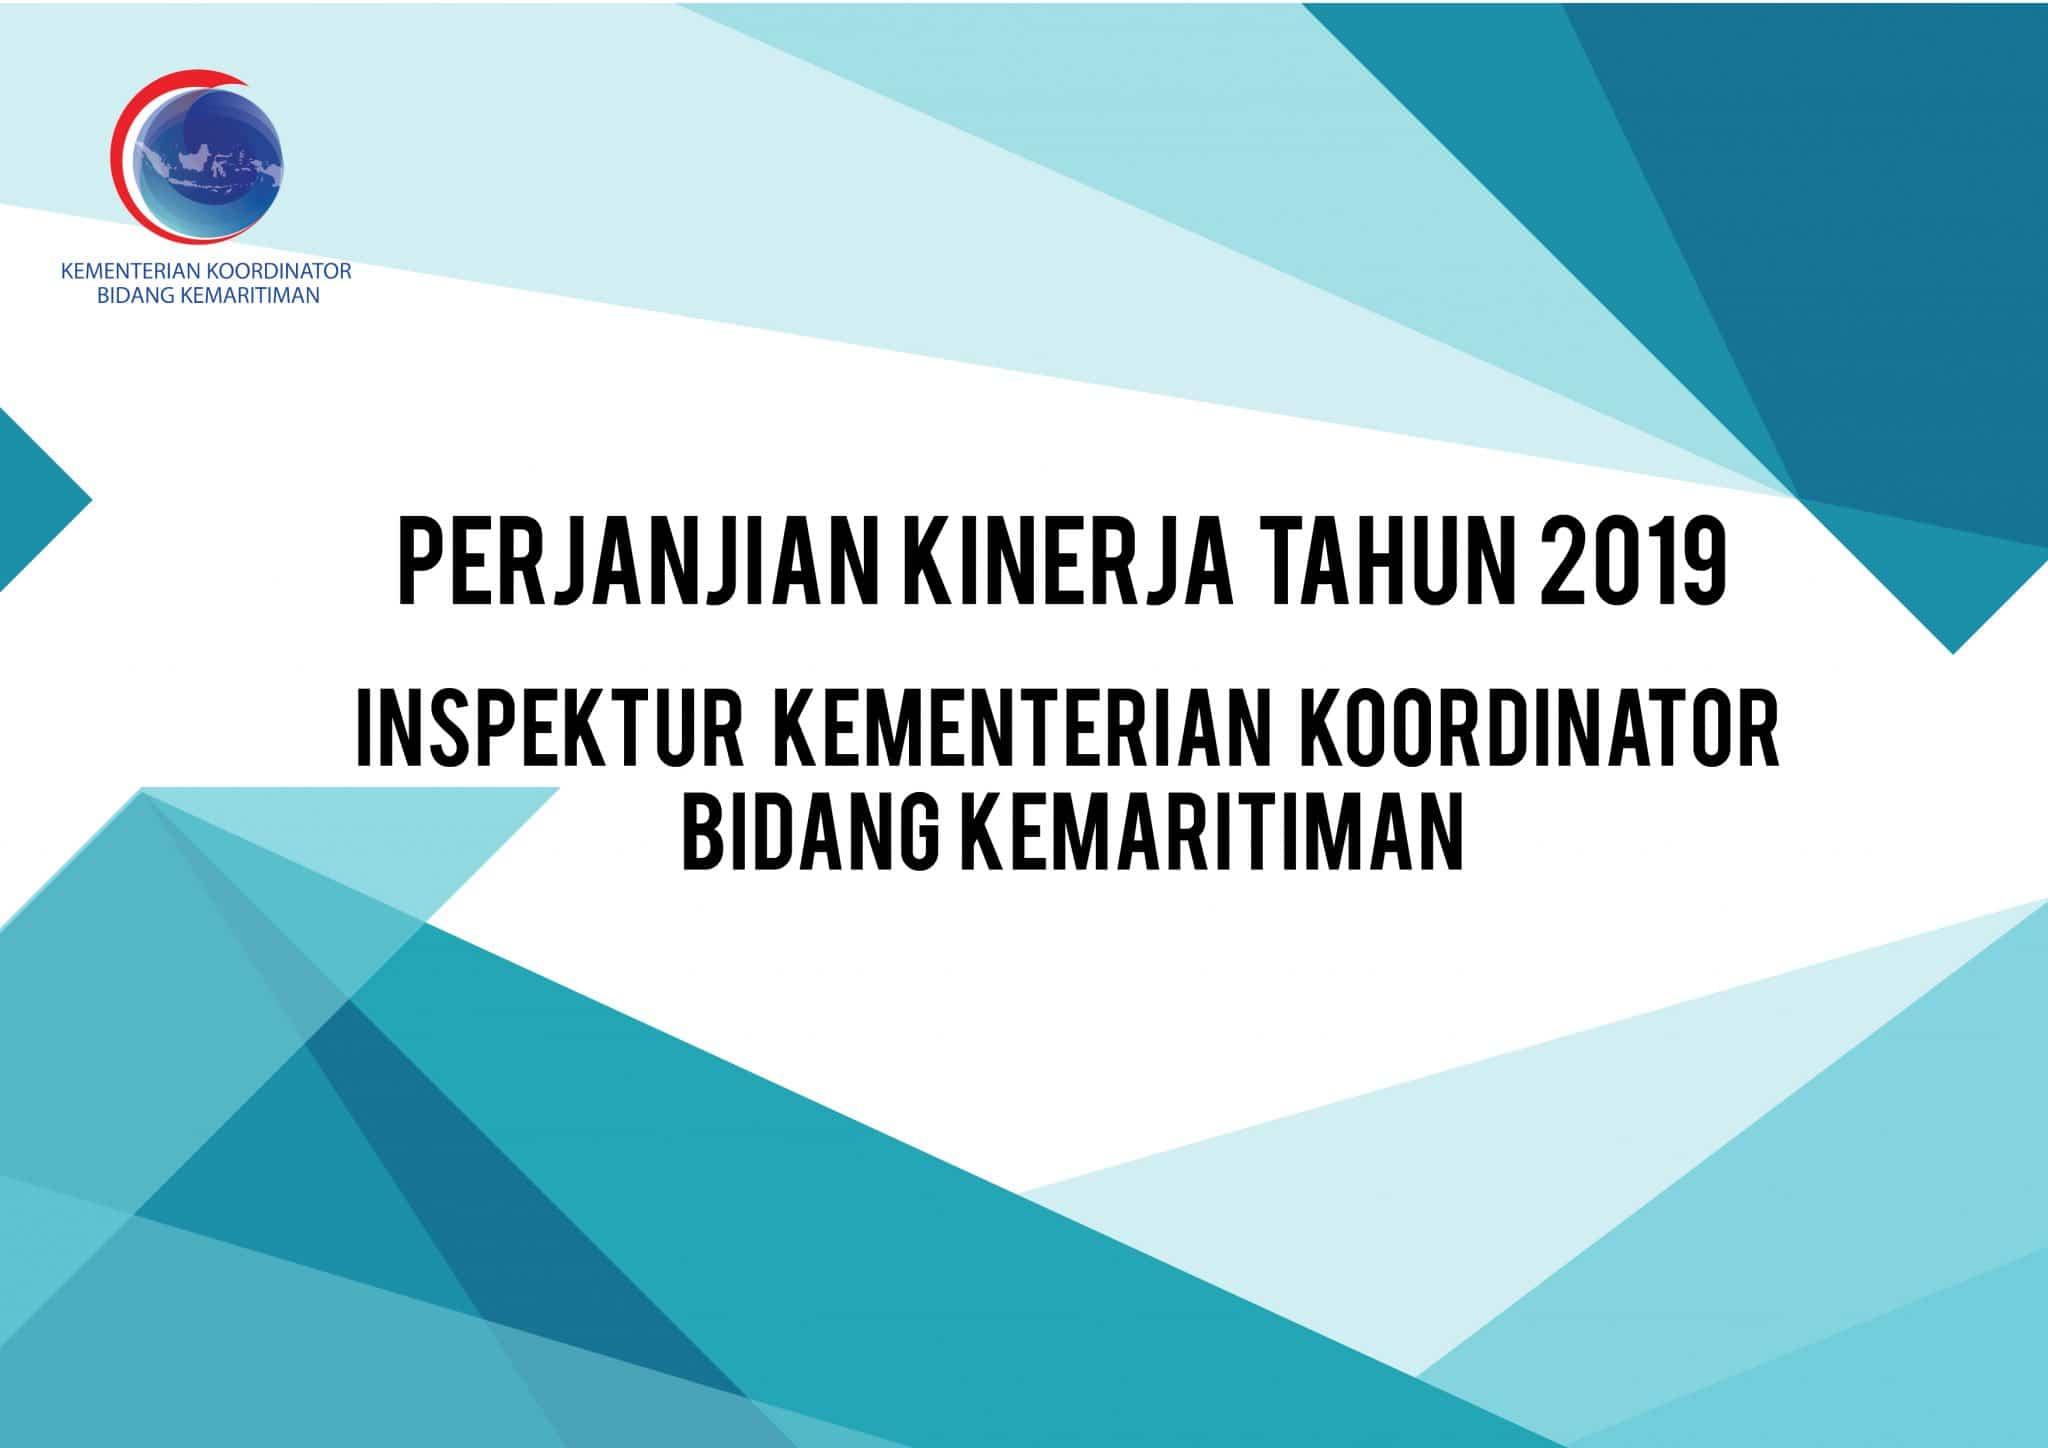 Perjanjian Kinerja Tahun 2019 Inspektur Kementerian Koordinator Bidang Kemaritiman